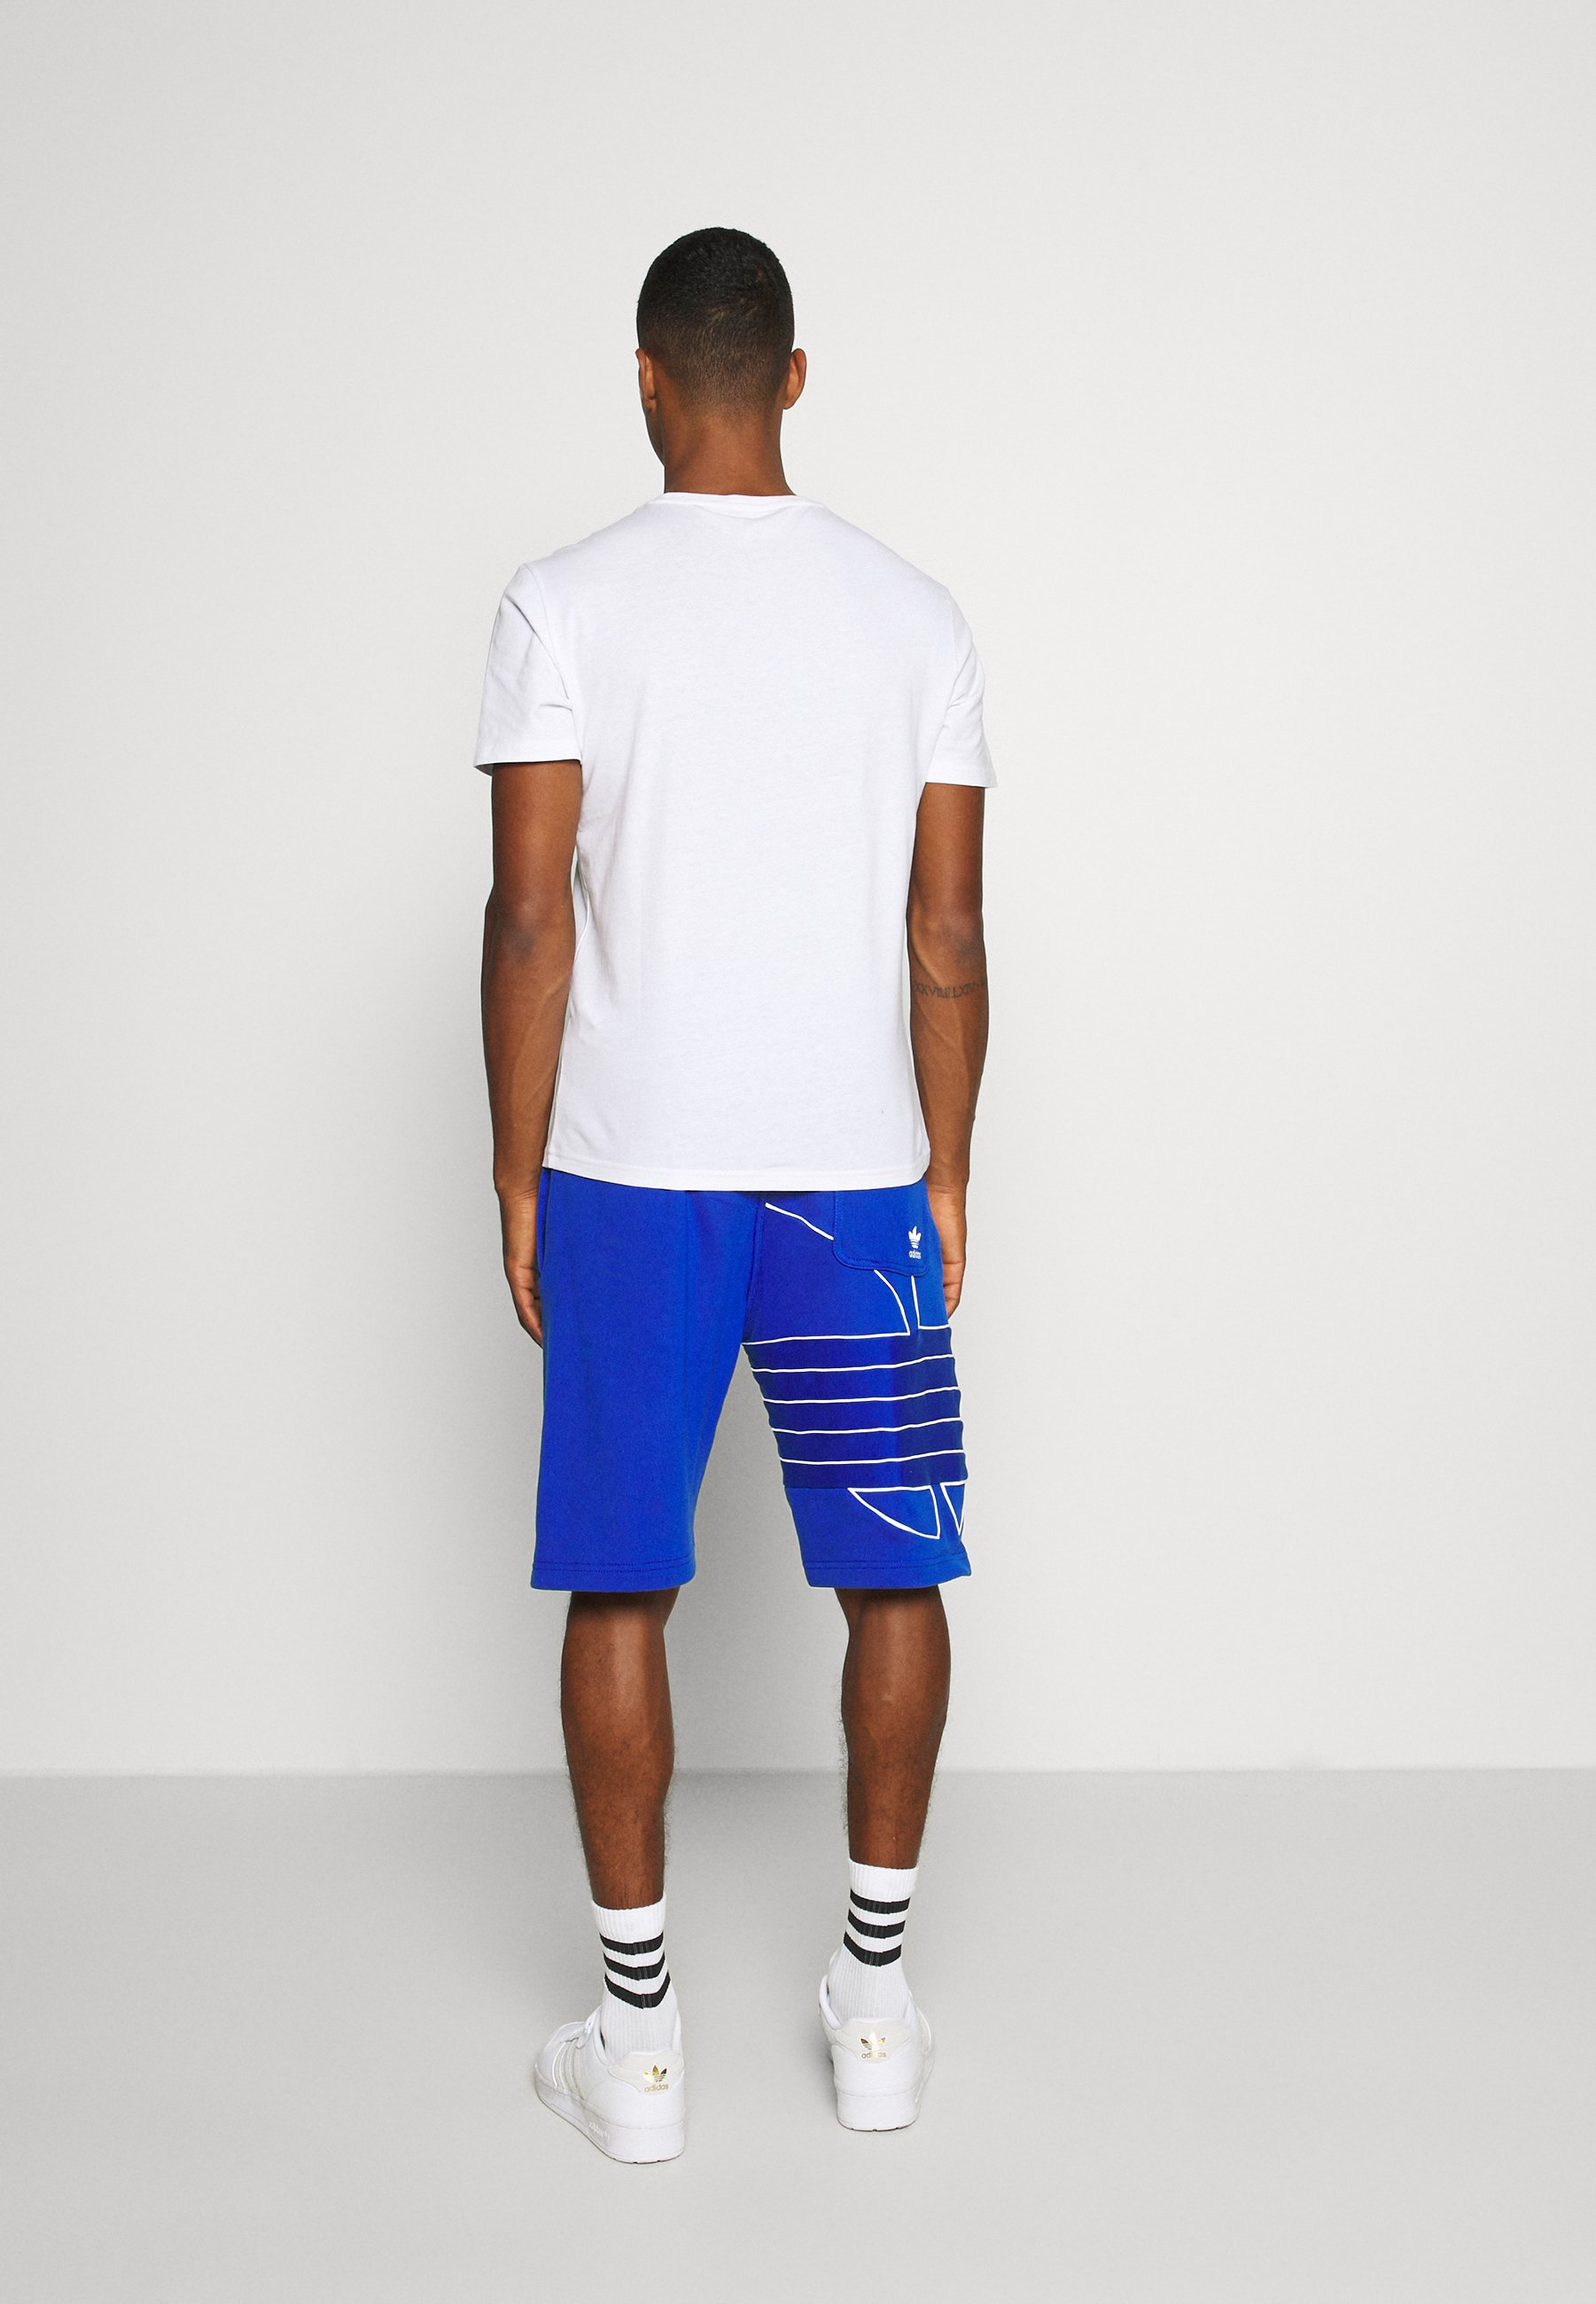 adidas Originals Tracksuit bottoms - royblu/white 8Cbaa